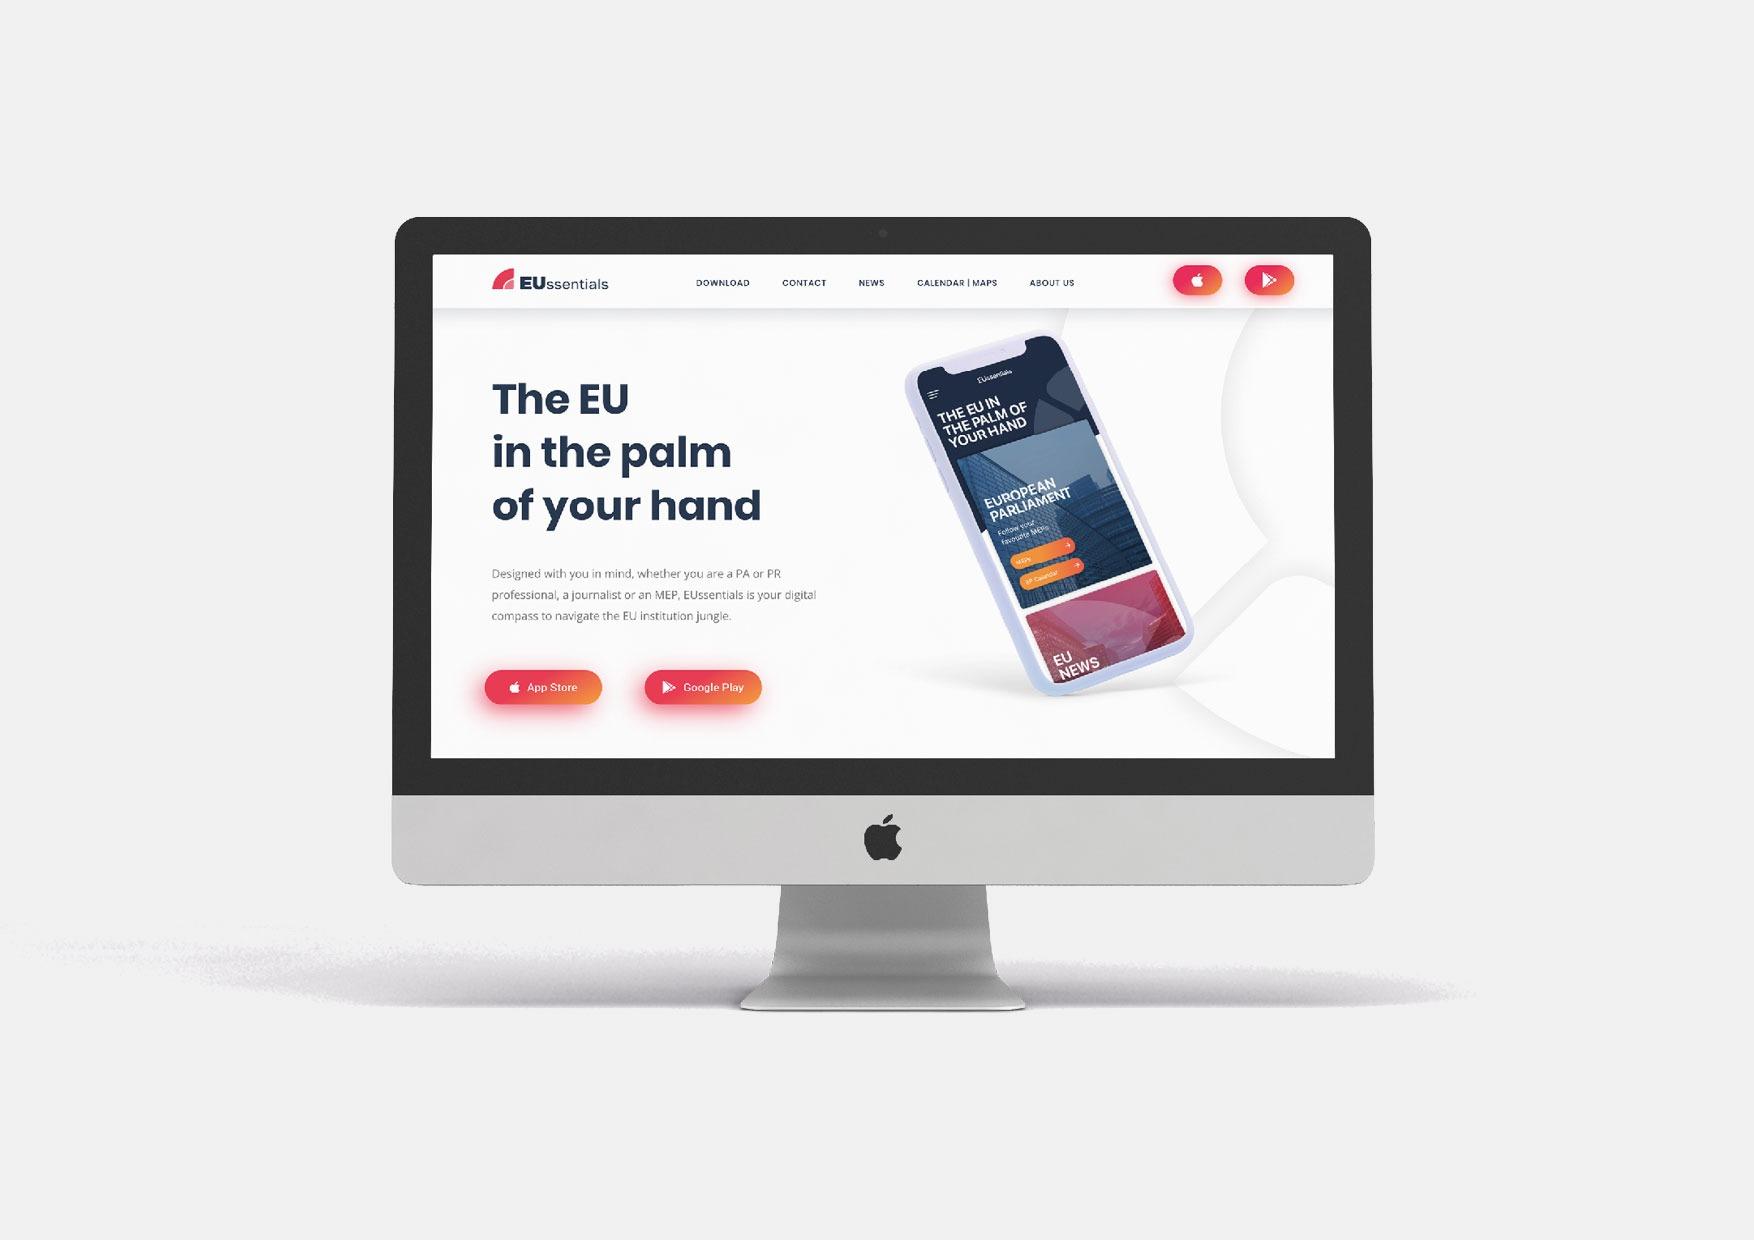 EUssentials_web